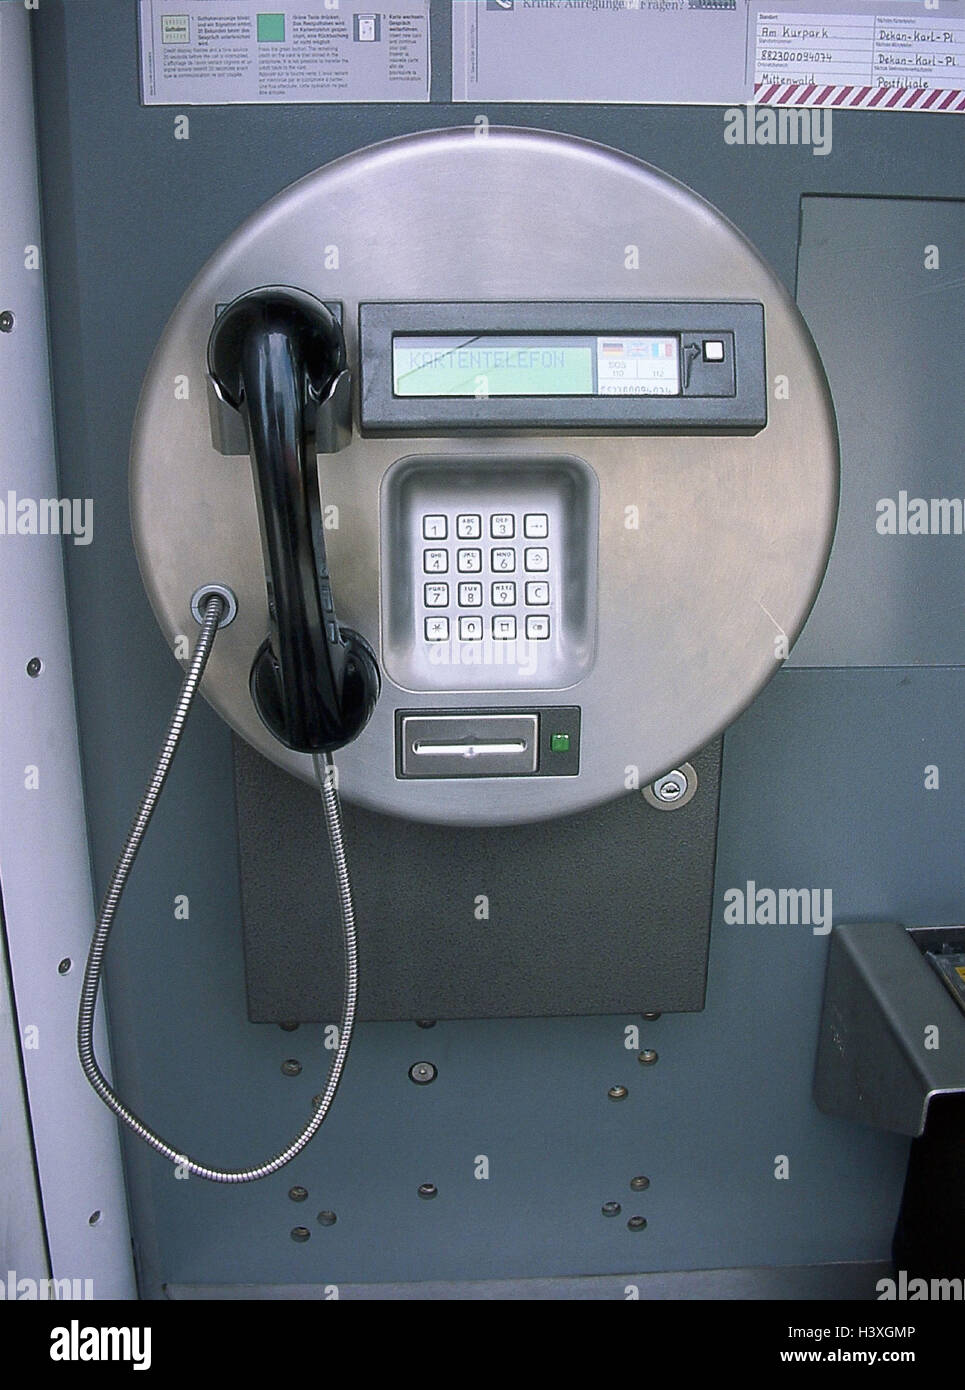 Telephone box, charge-cardphone telephone, publicly, telecommunication, communication, phone, call up, connection, - Stock Image